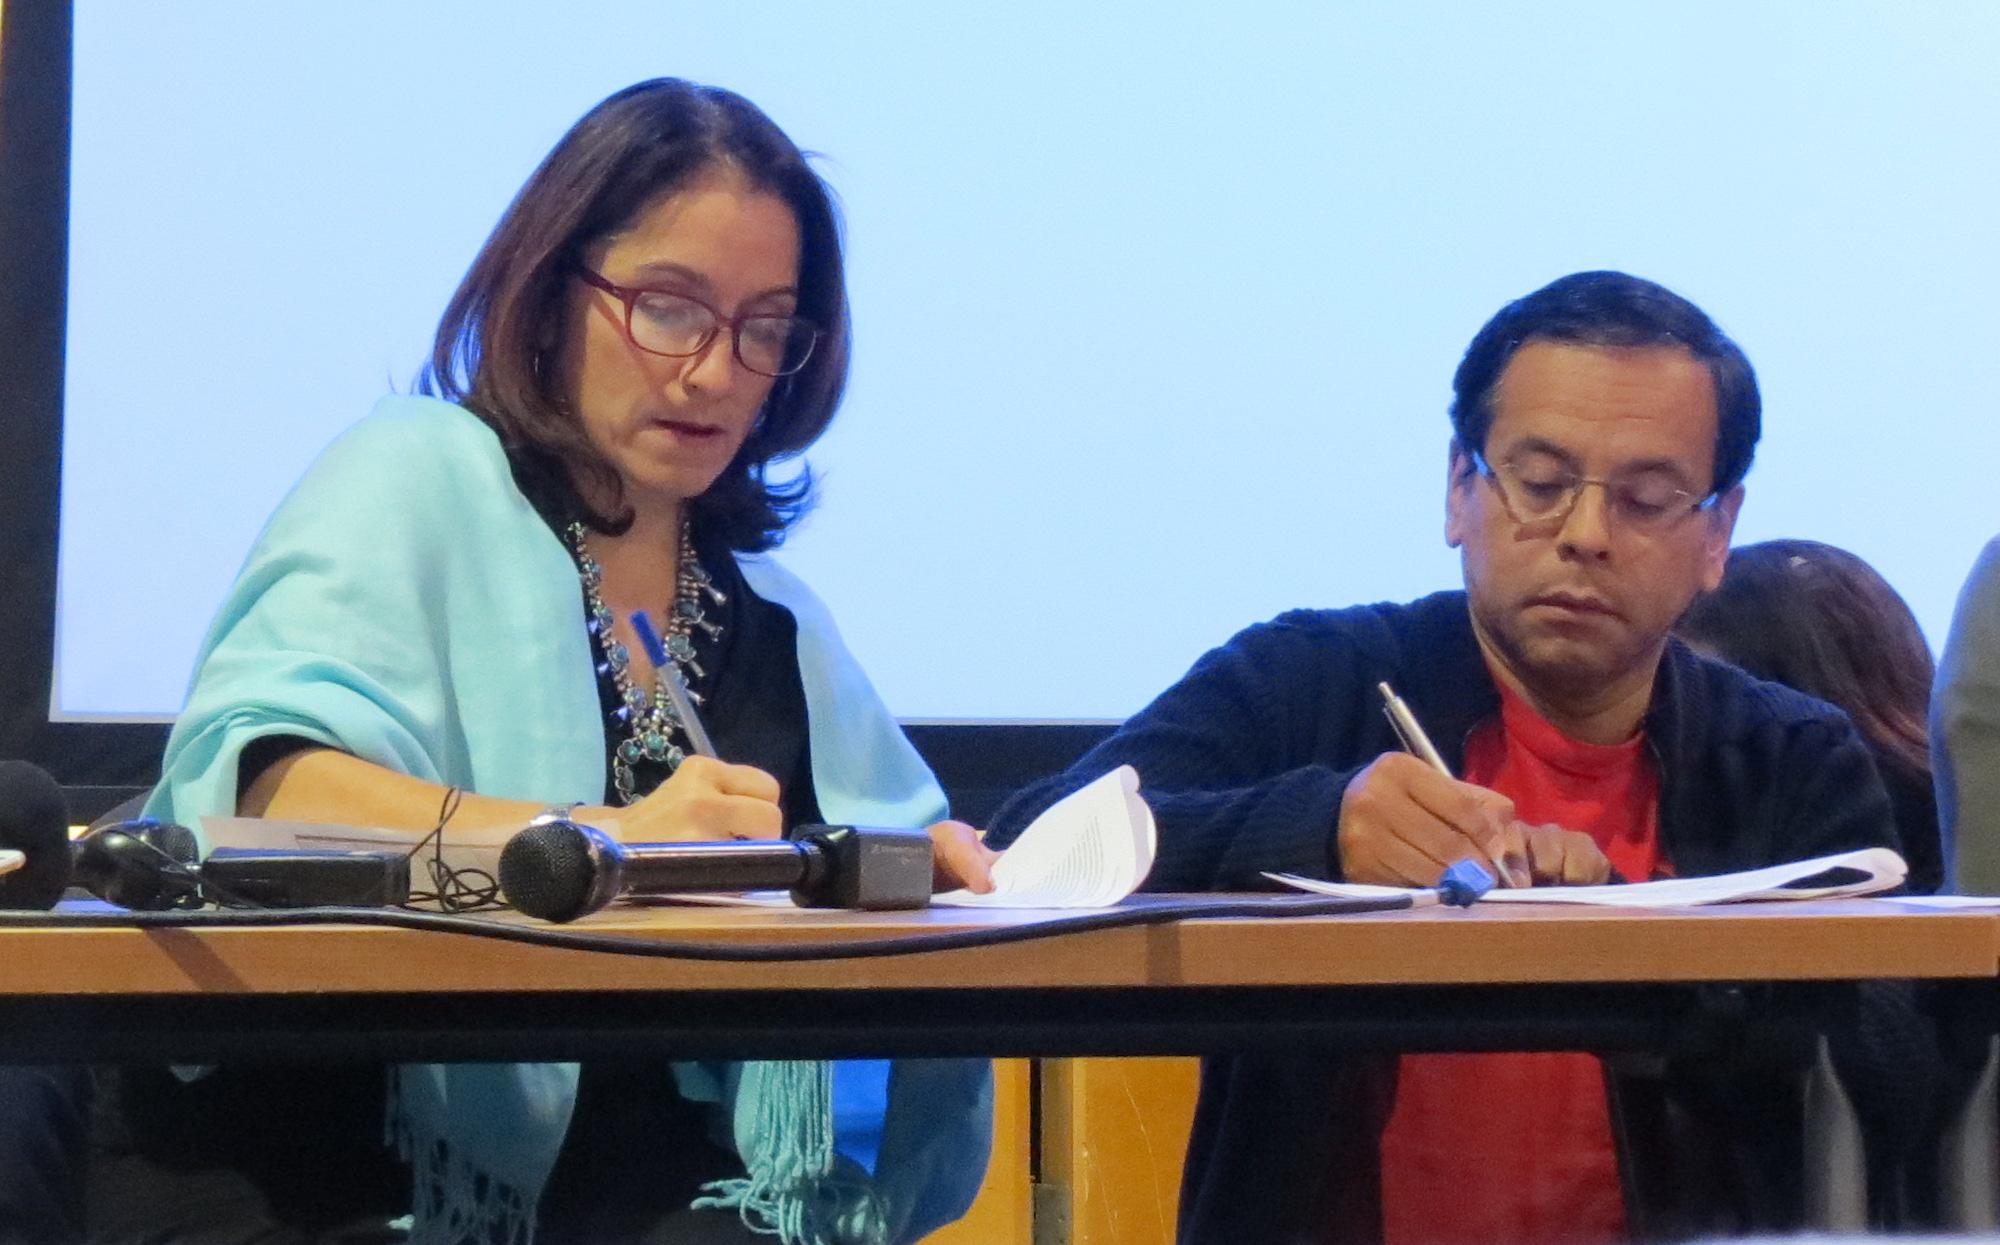 Photo: Denver Teacher Strike Ends Cordova Roman JB